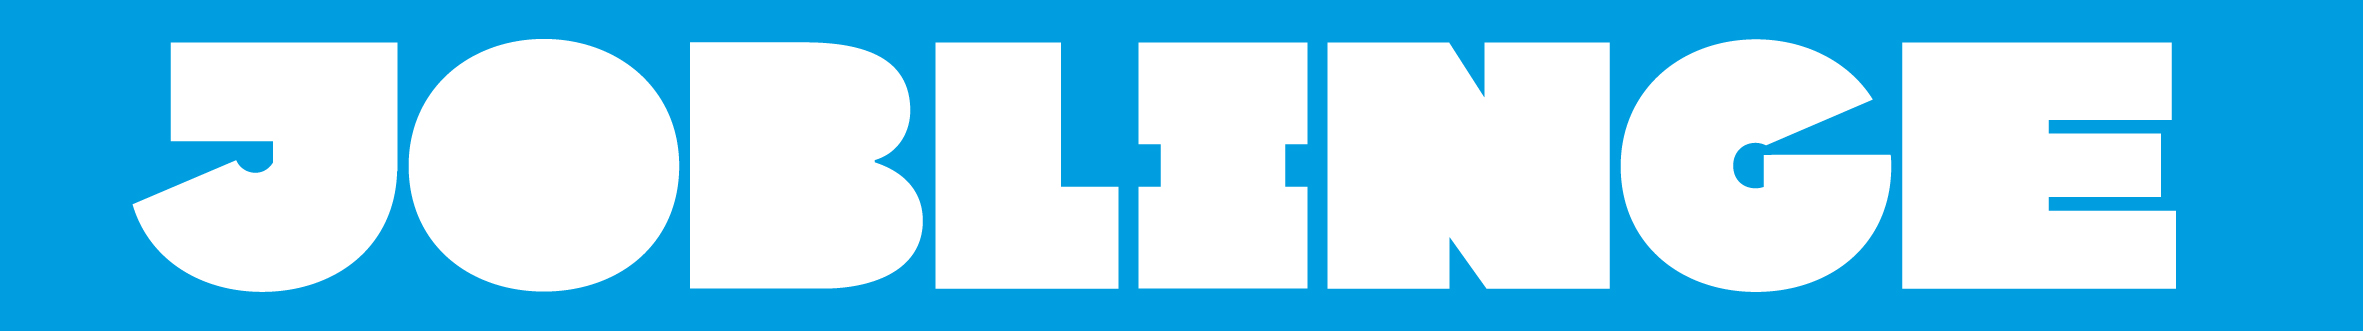 JOBLINGE_Logo_Brief_100x14mm_600dpi